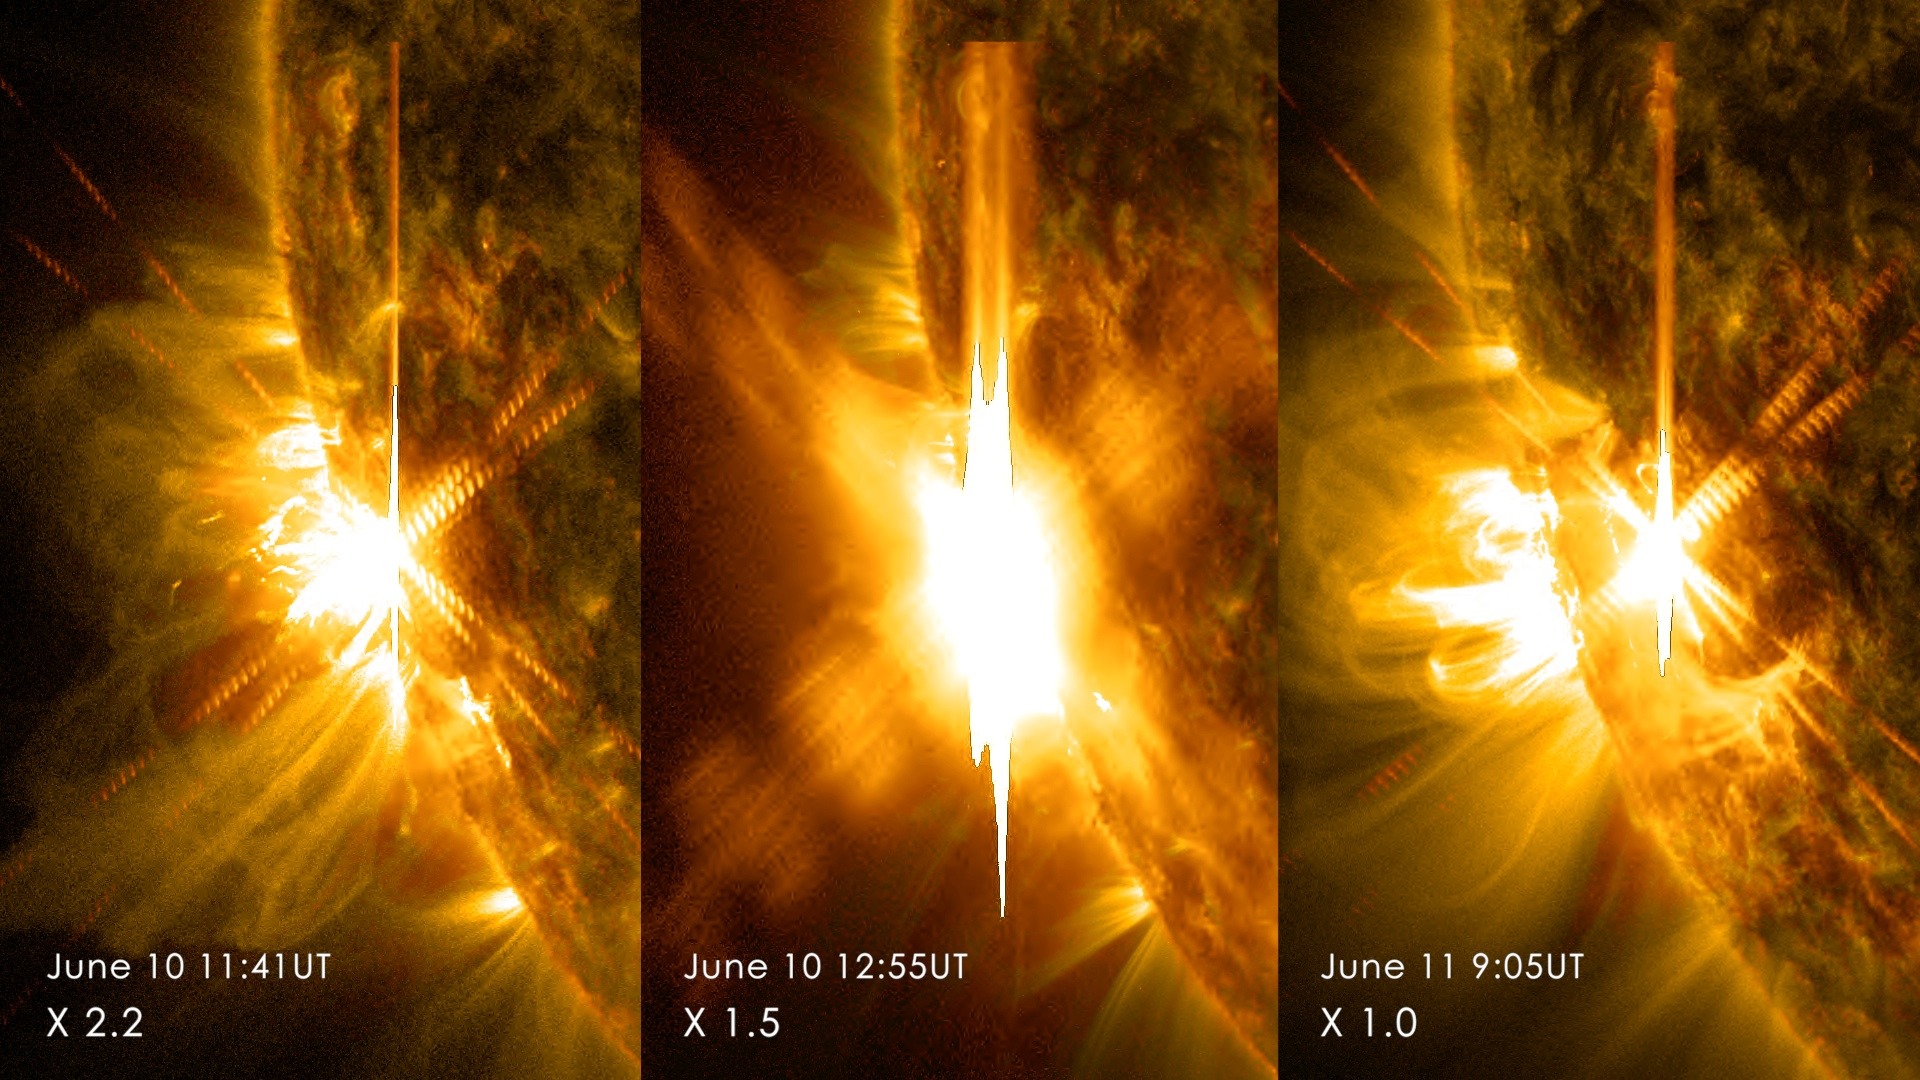 3 X-Class Solar Flares in 2 Days